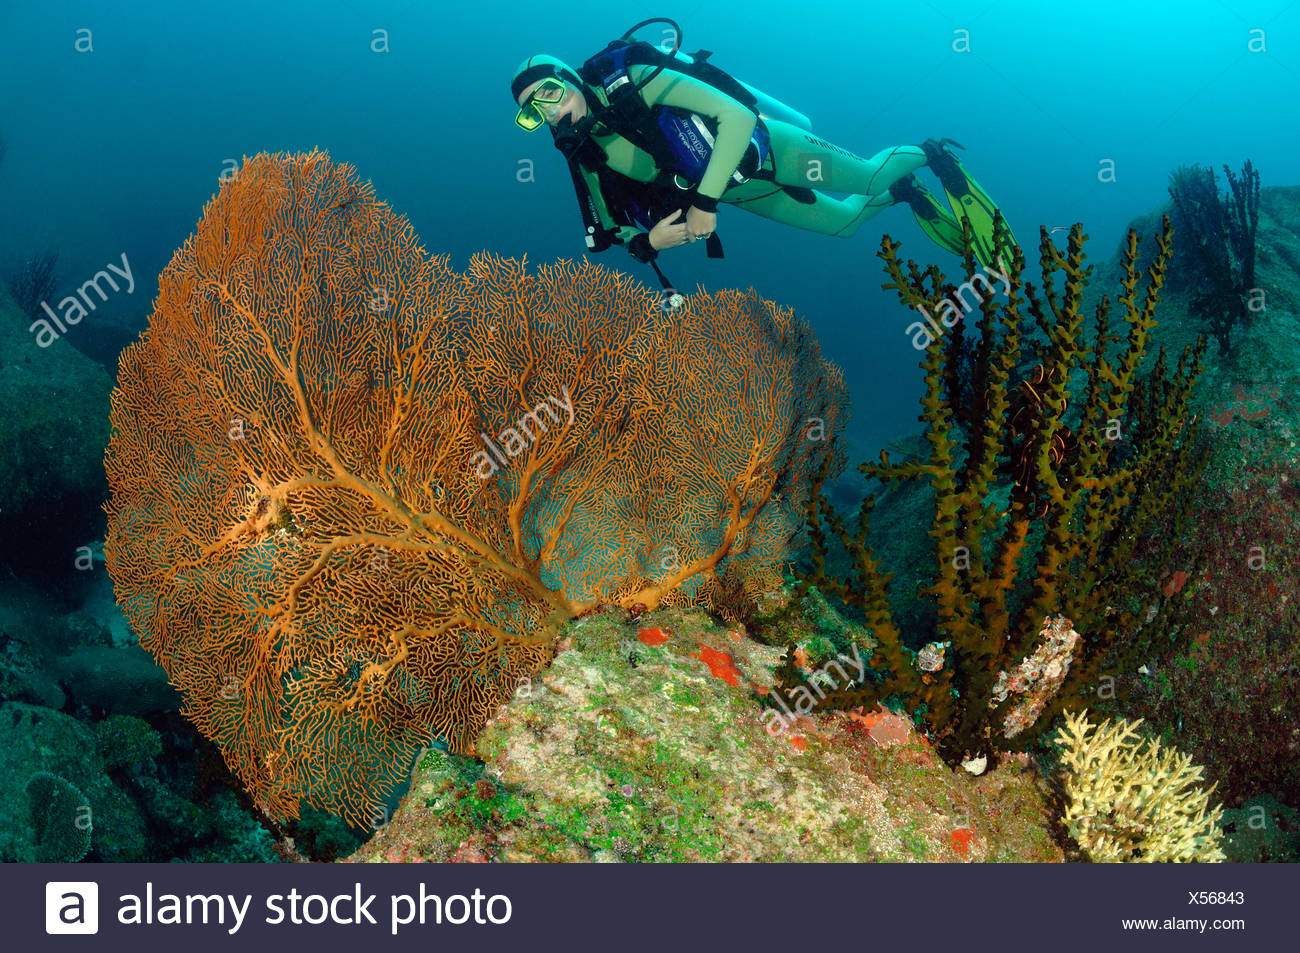 Scuba diving over Coral Reef, Richelieu Rock, Surin Islands, Thailand - Stock Image